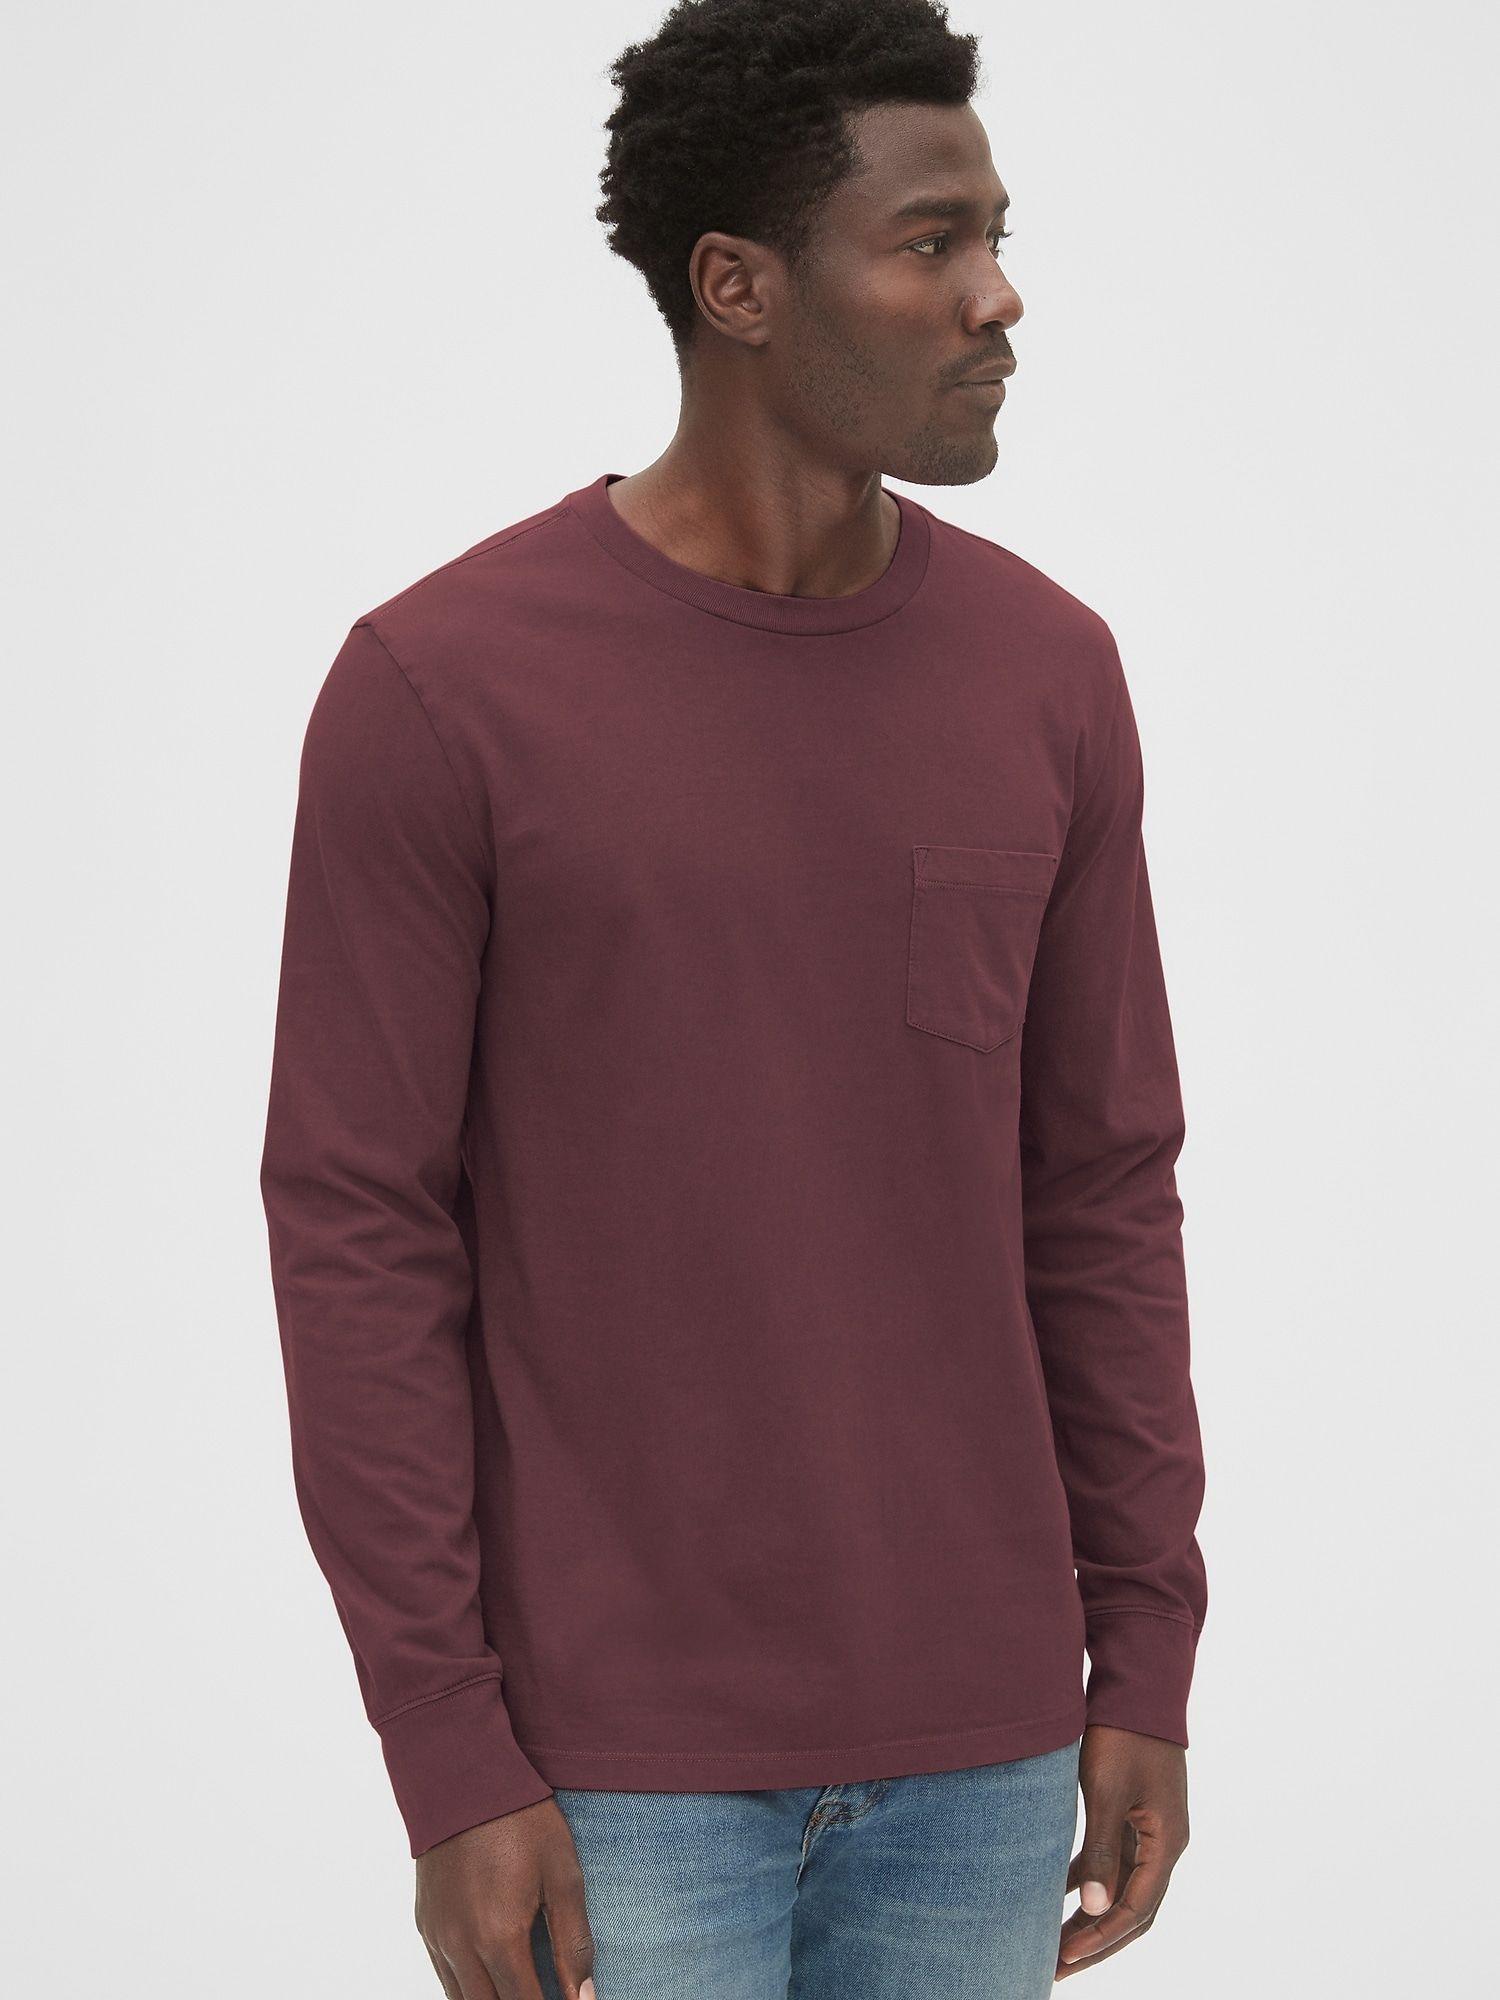 Long Sleeve Pocket T Shirt Long Sleeve Mens Tops Gap Men